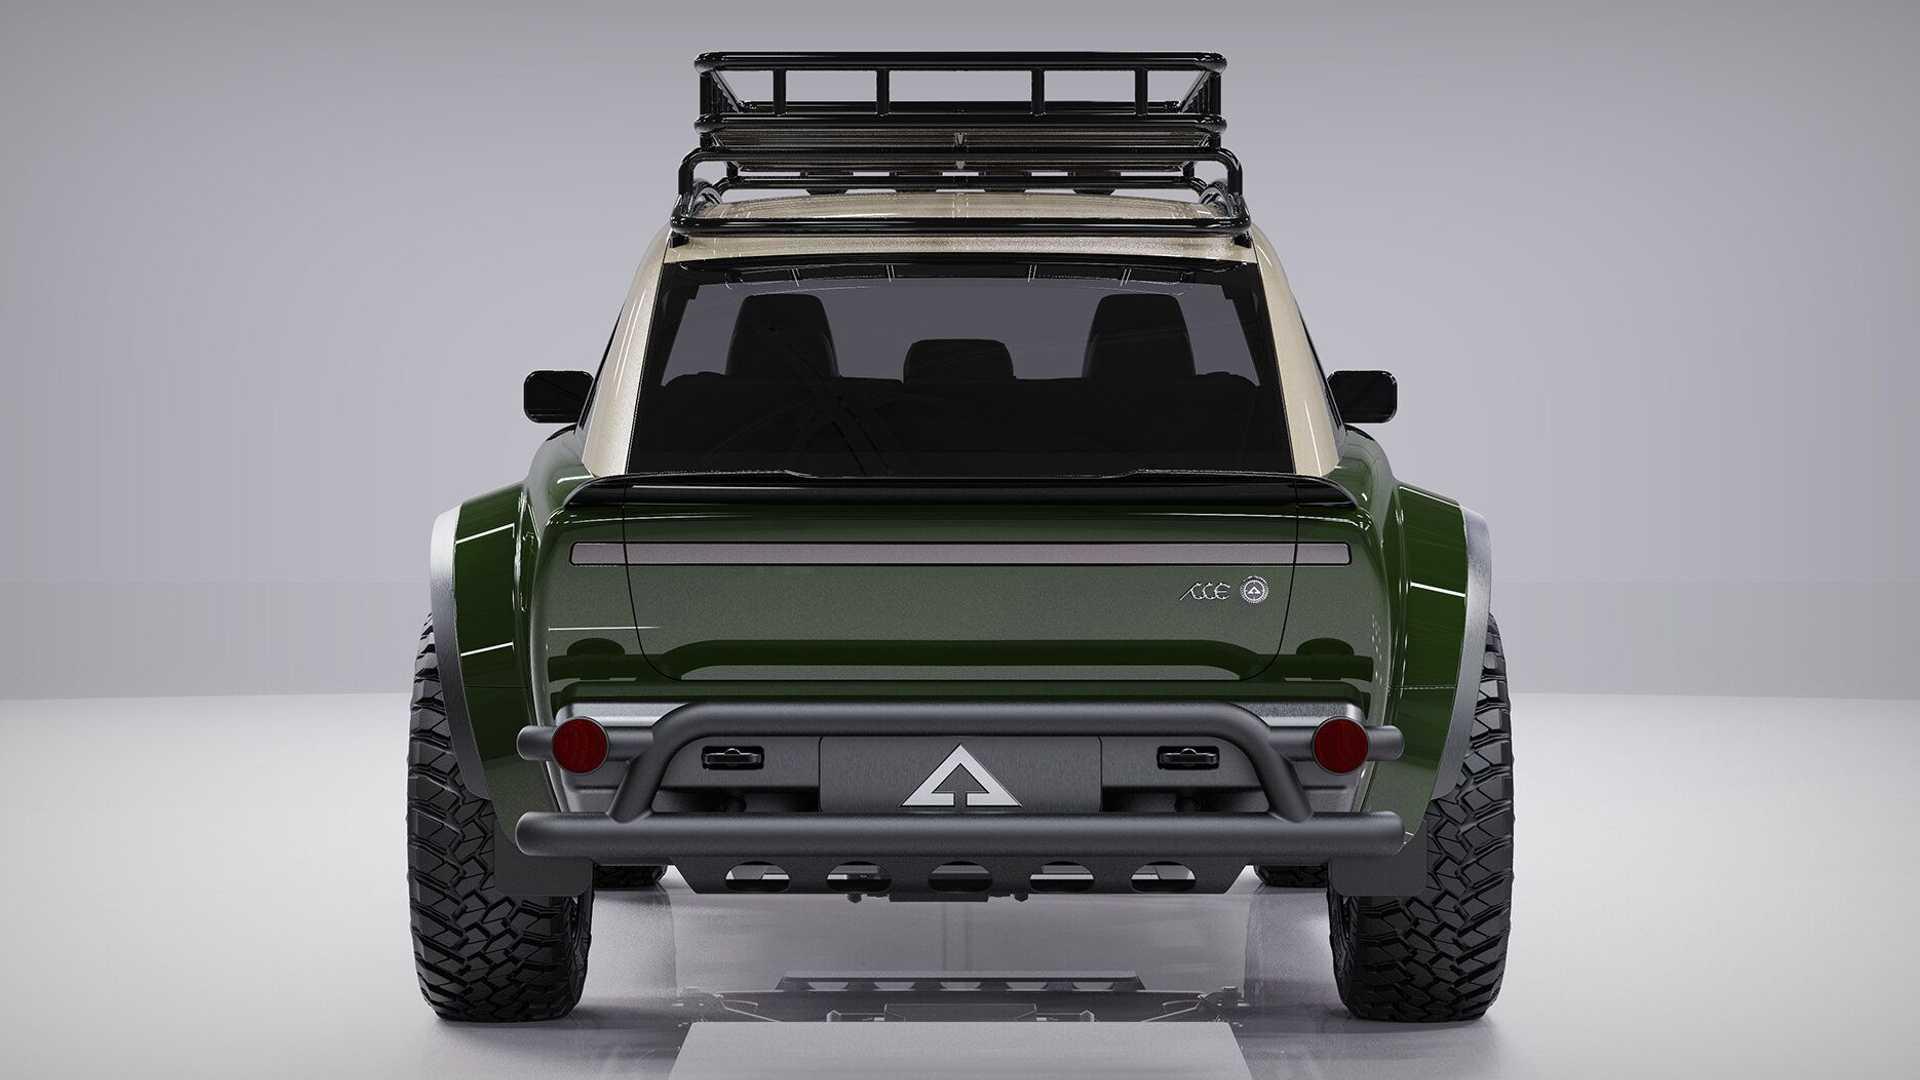 Alpha Jax Electric Cuv Rear